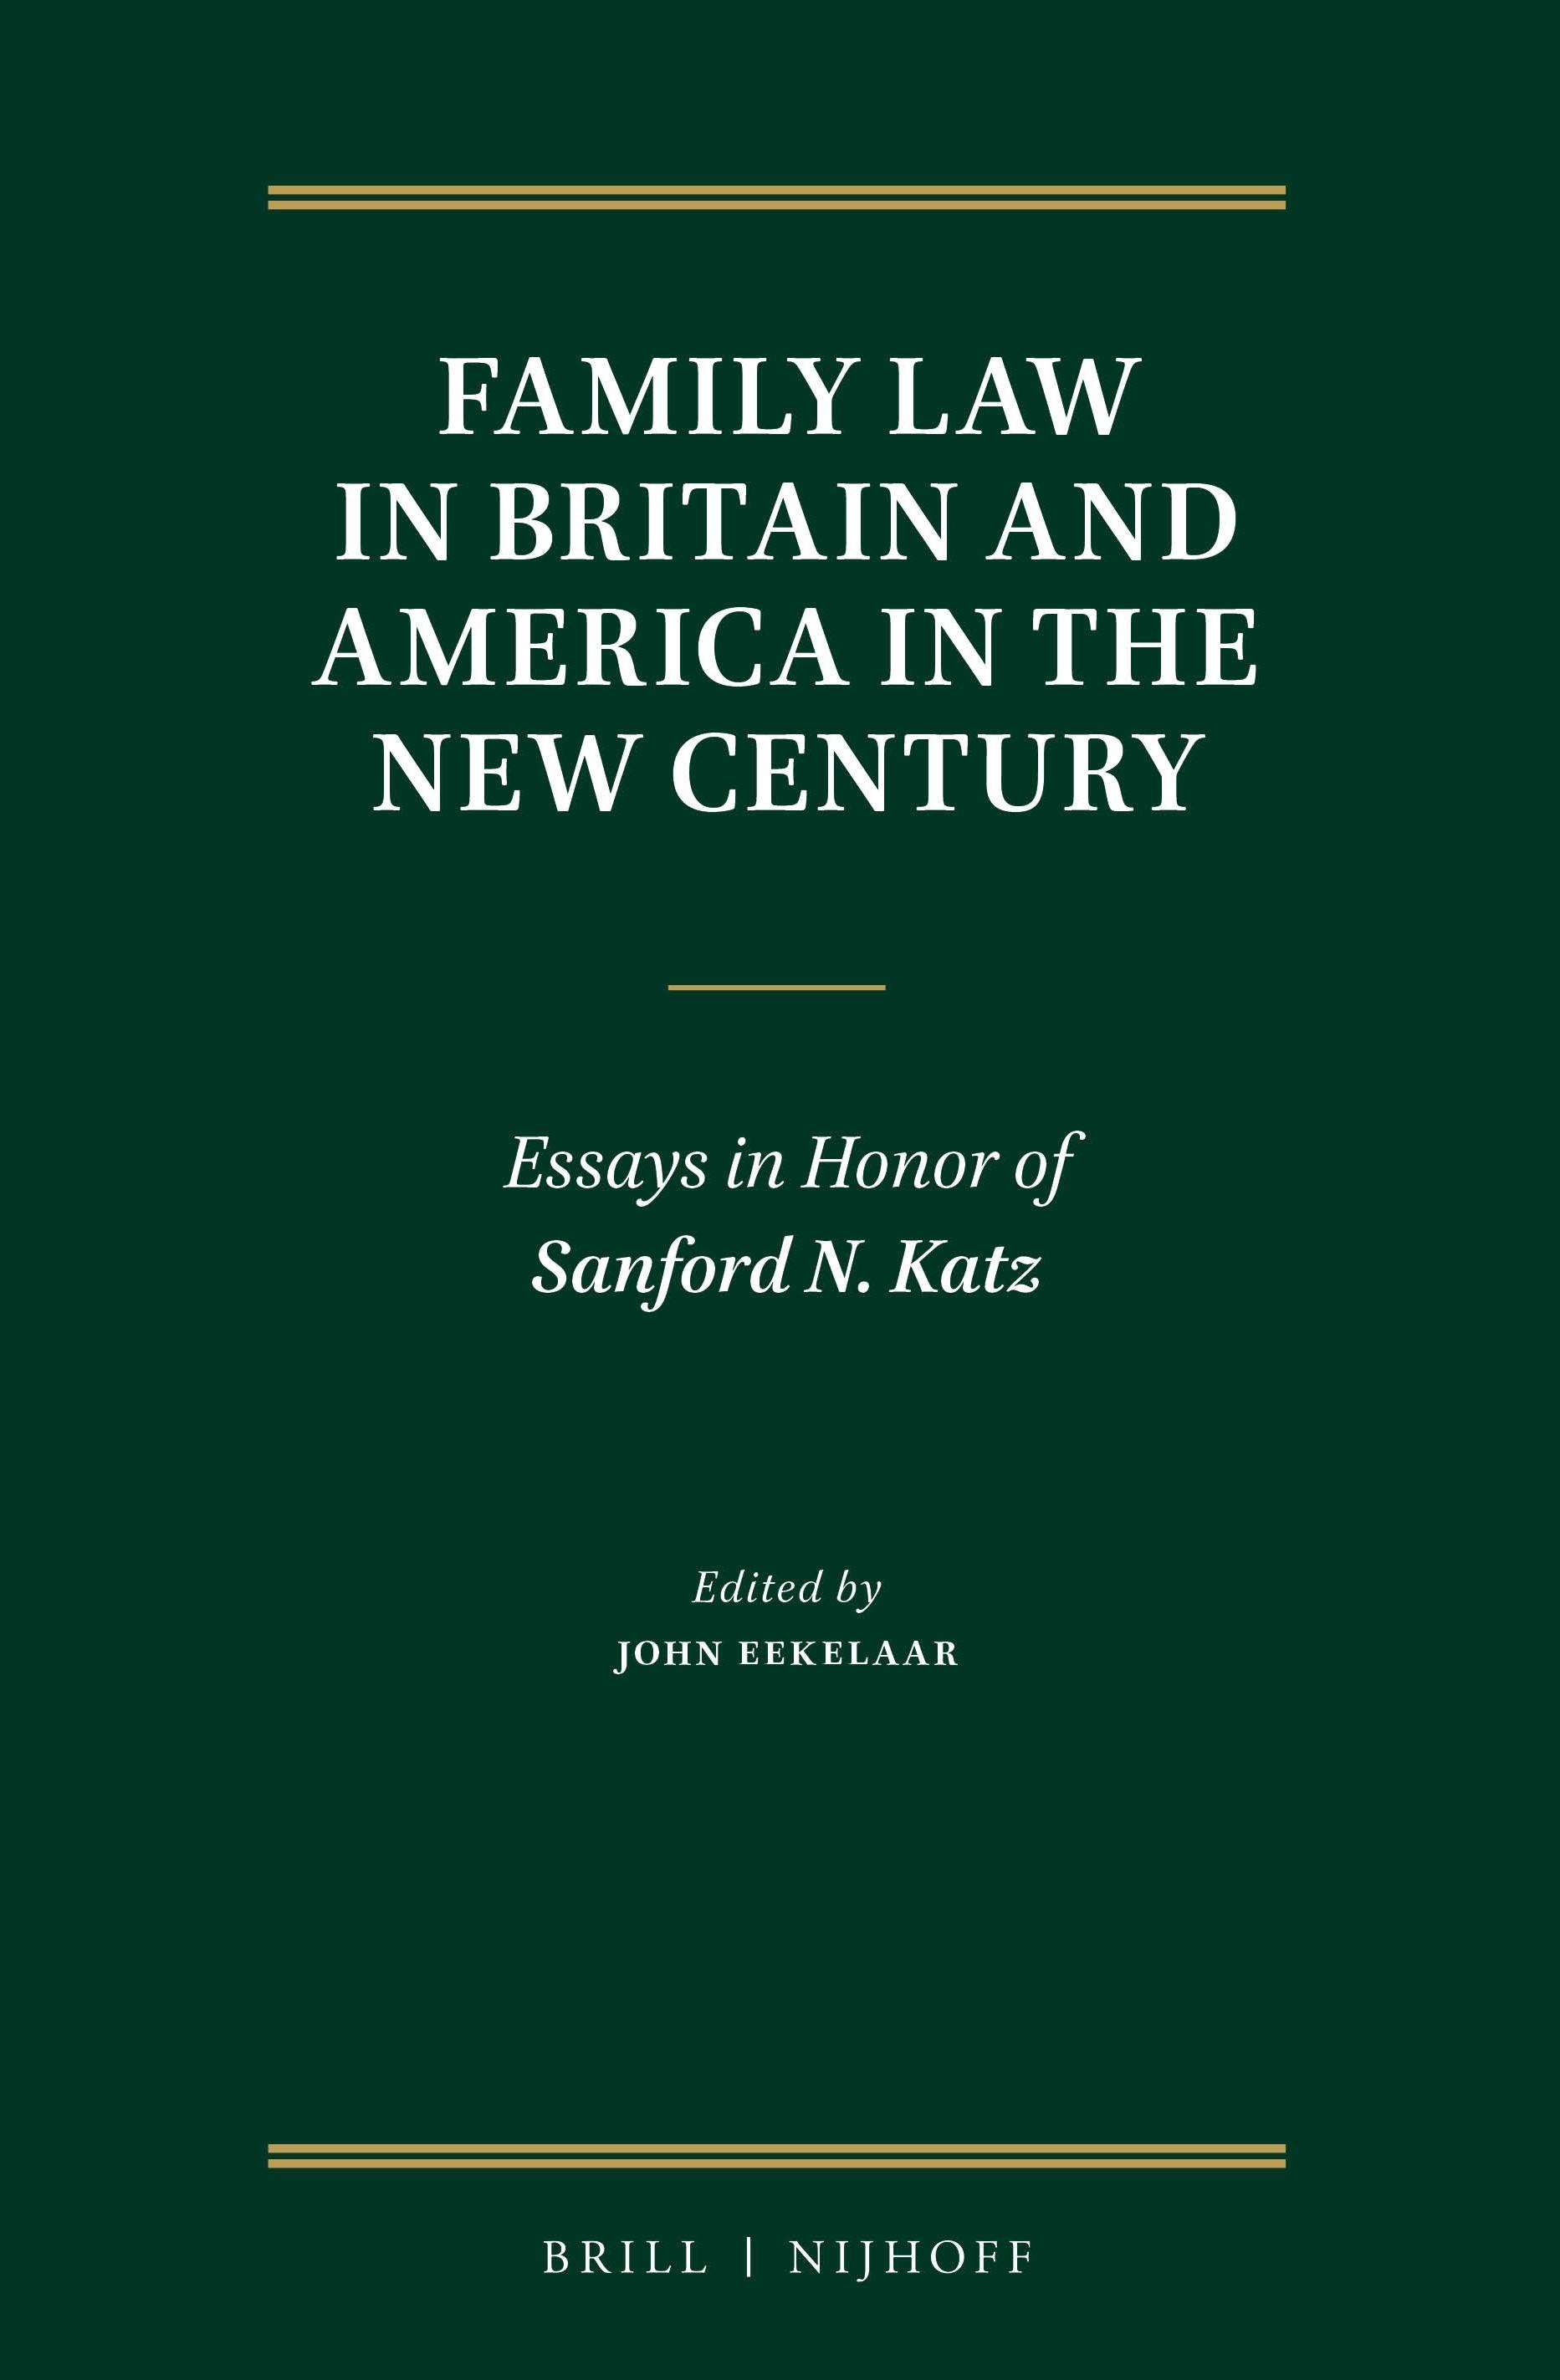 Abbildung von Eekelaar | Family Law in Britain and America in the New Century | 2016